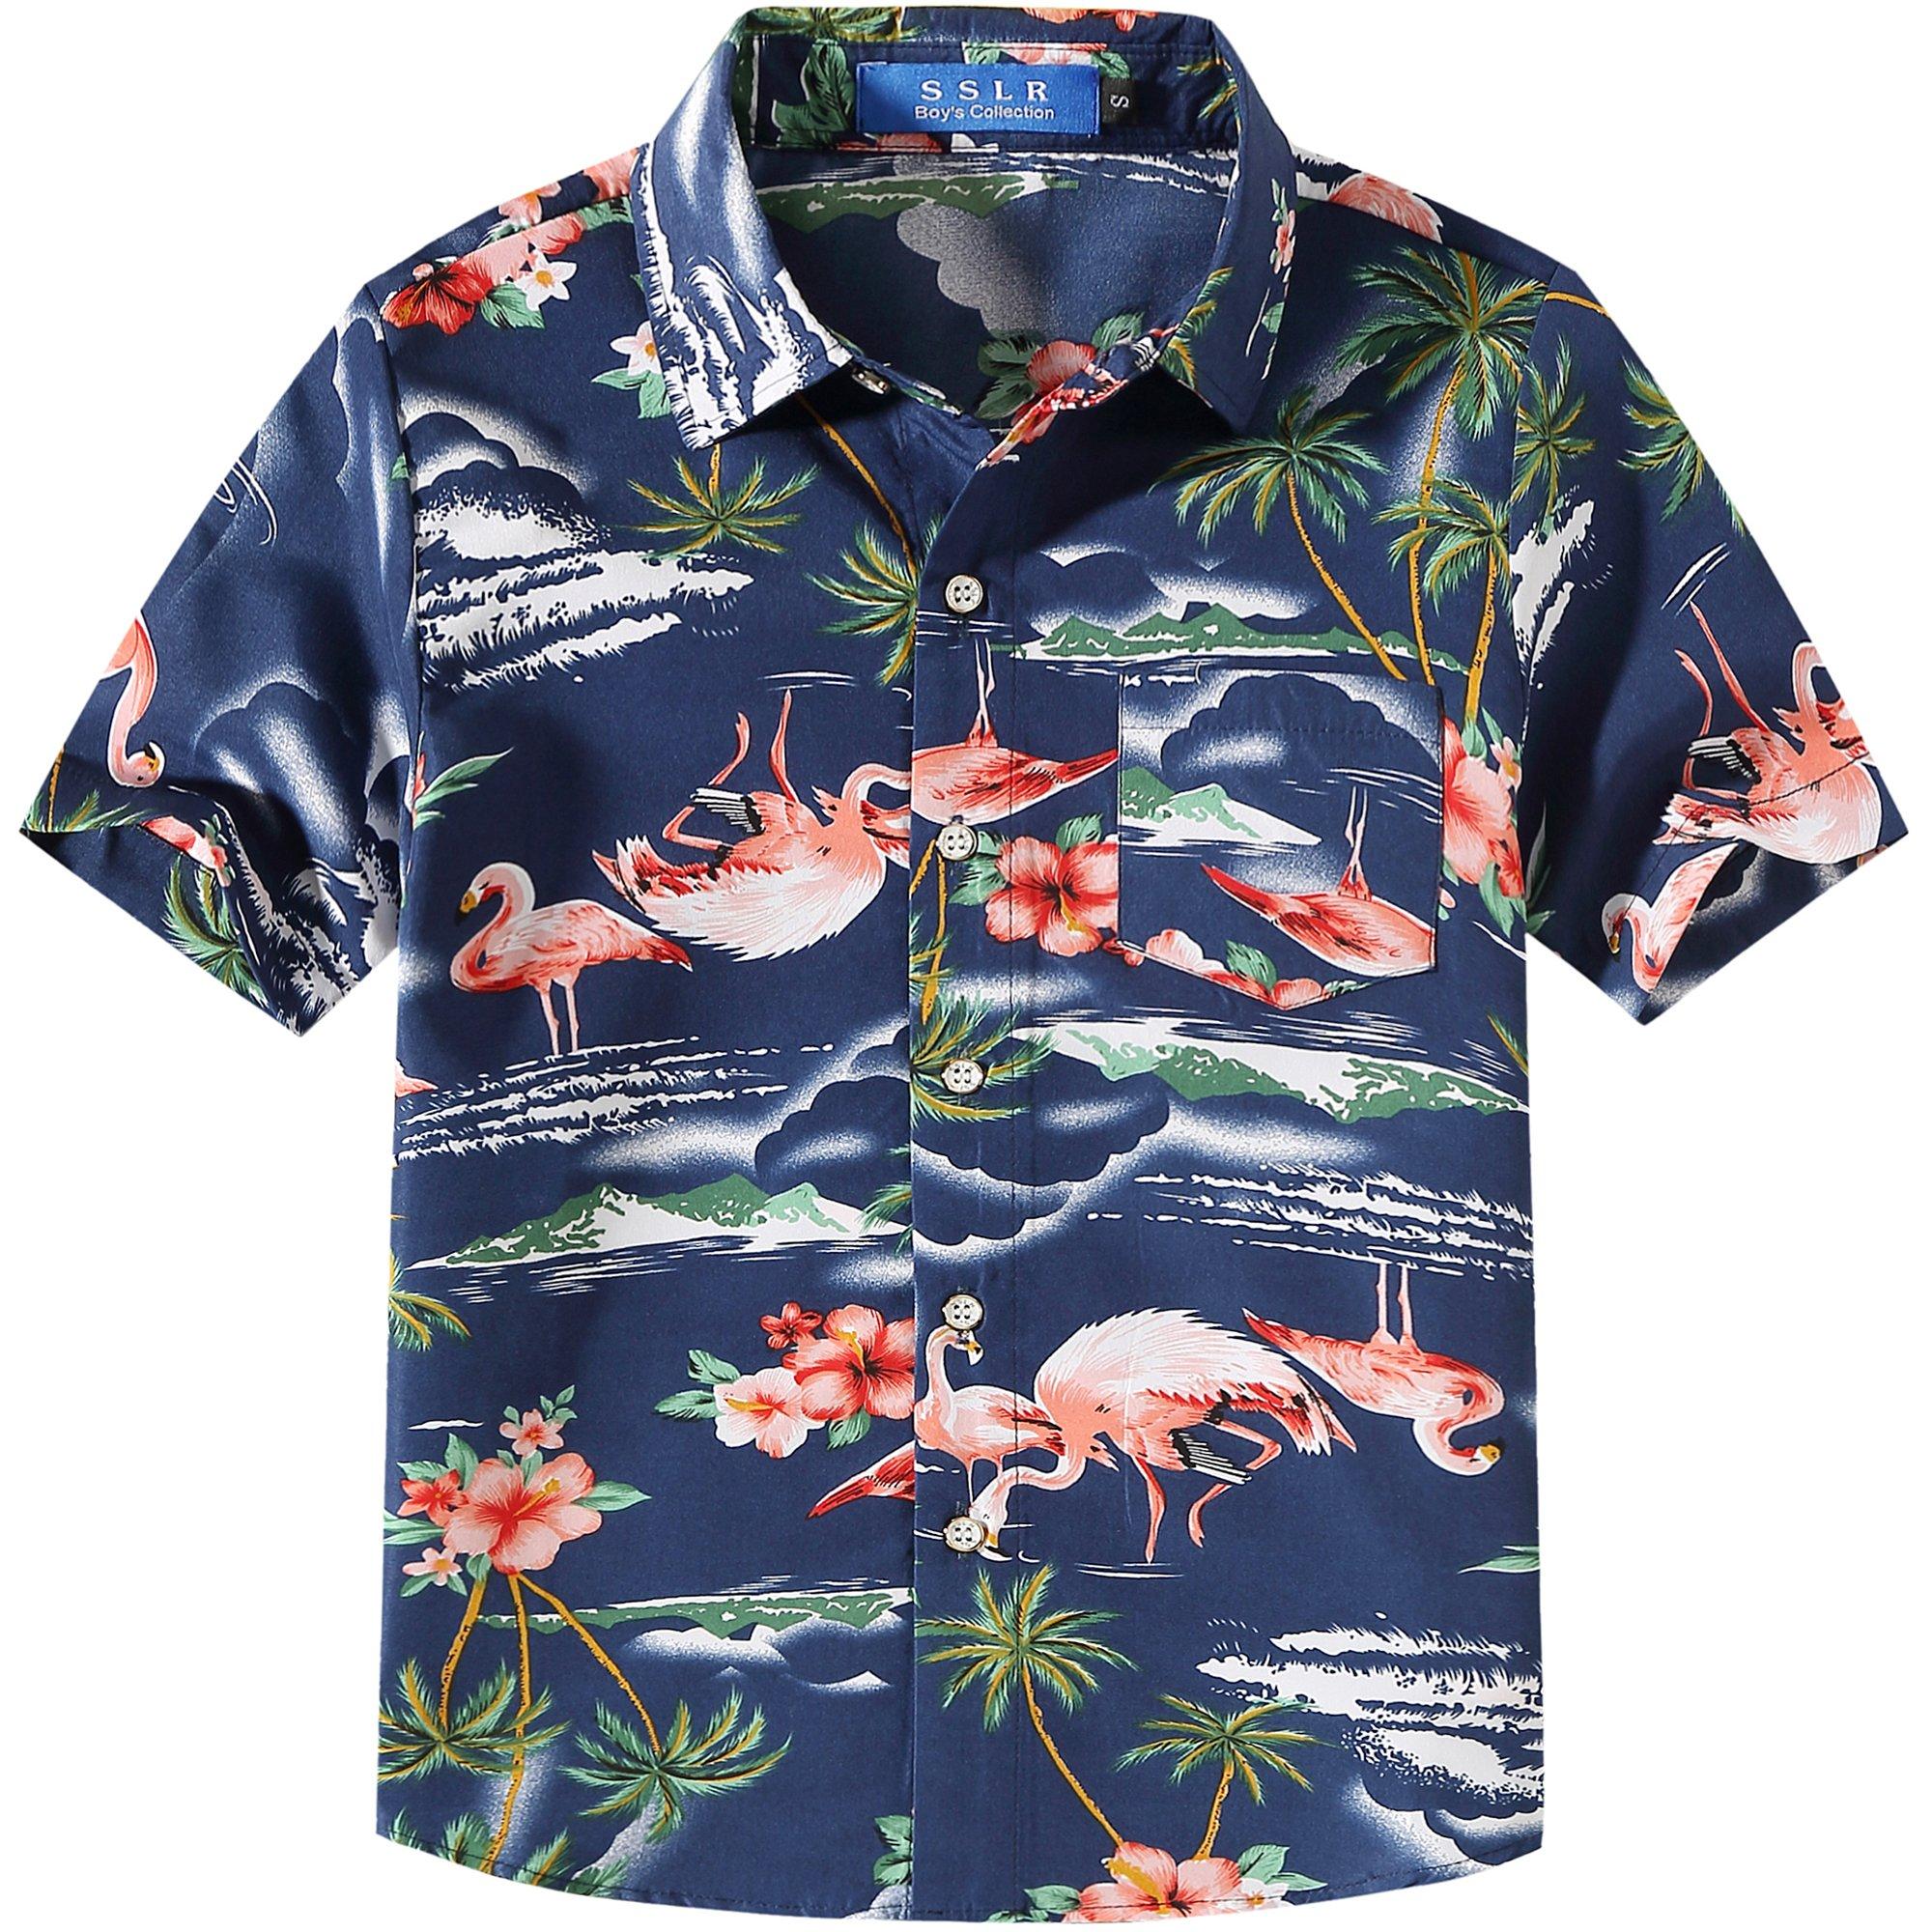 SSLR Big Boy's Flamingos Button Down Short Sleeve Aloha Hawaiian Shirt (Large(14-16), Dark Blue) by SSLR (Image #1)